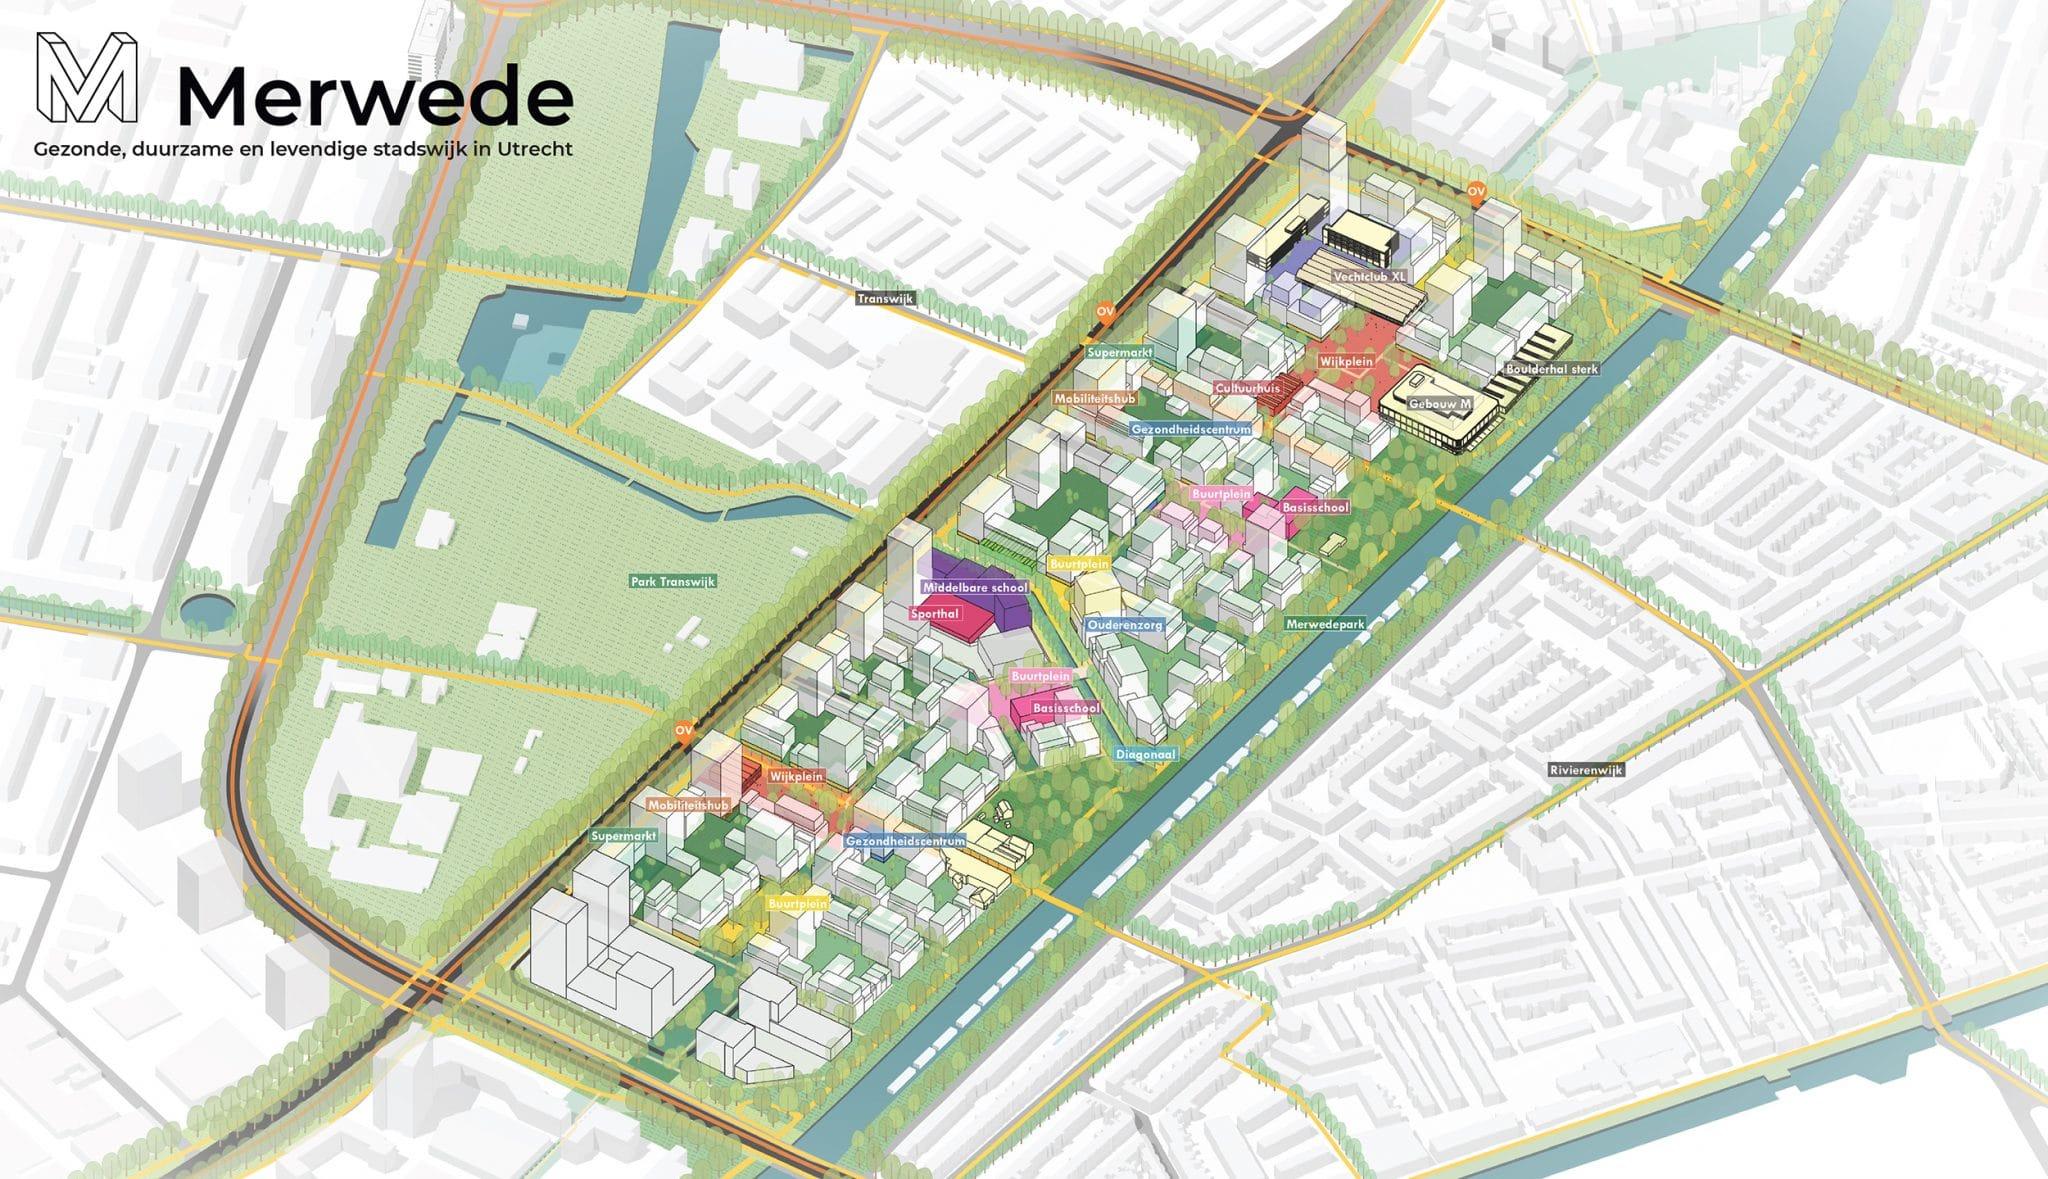 Merwede stadsontwikkeling